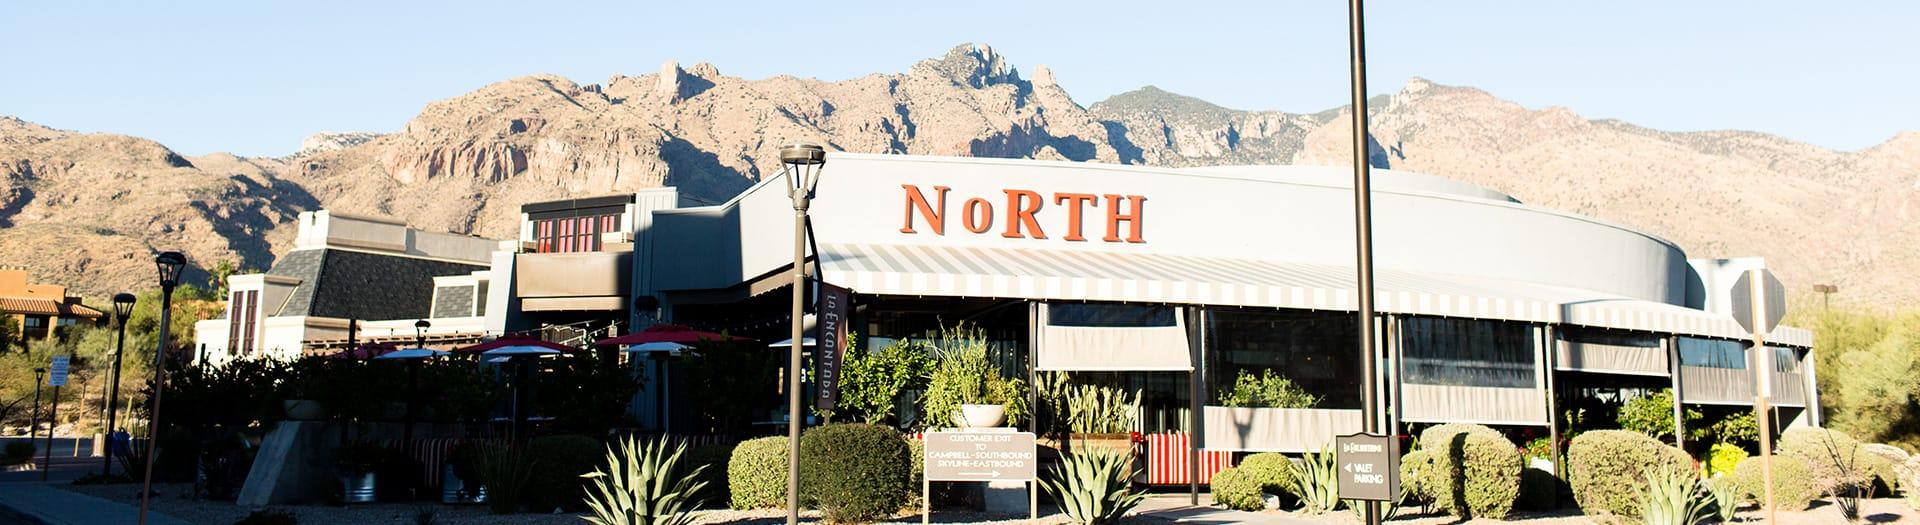 North Italia – Tucson - Tucson, AZ